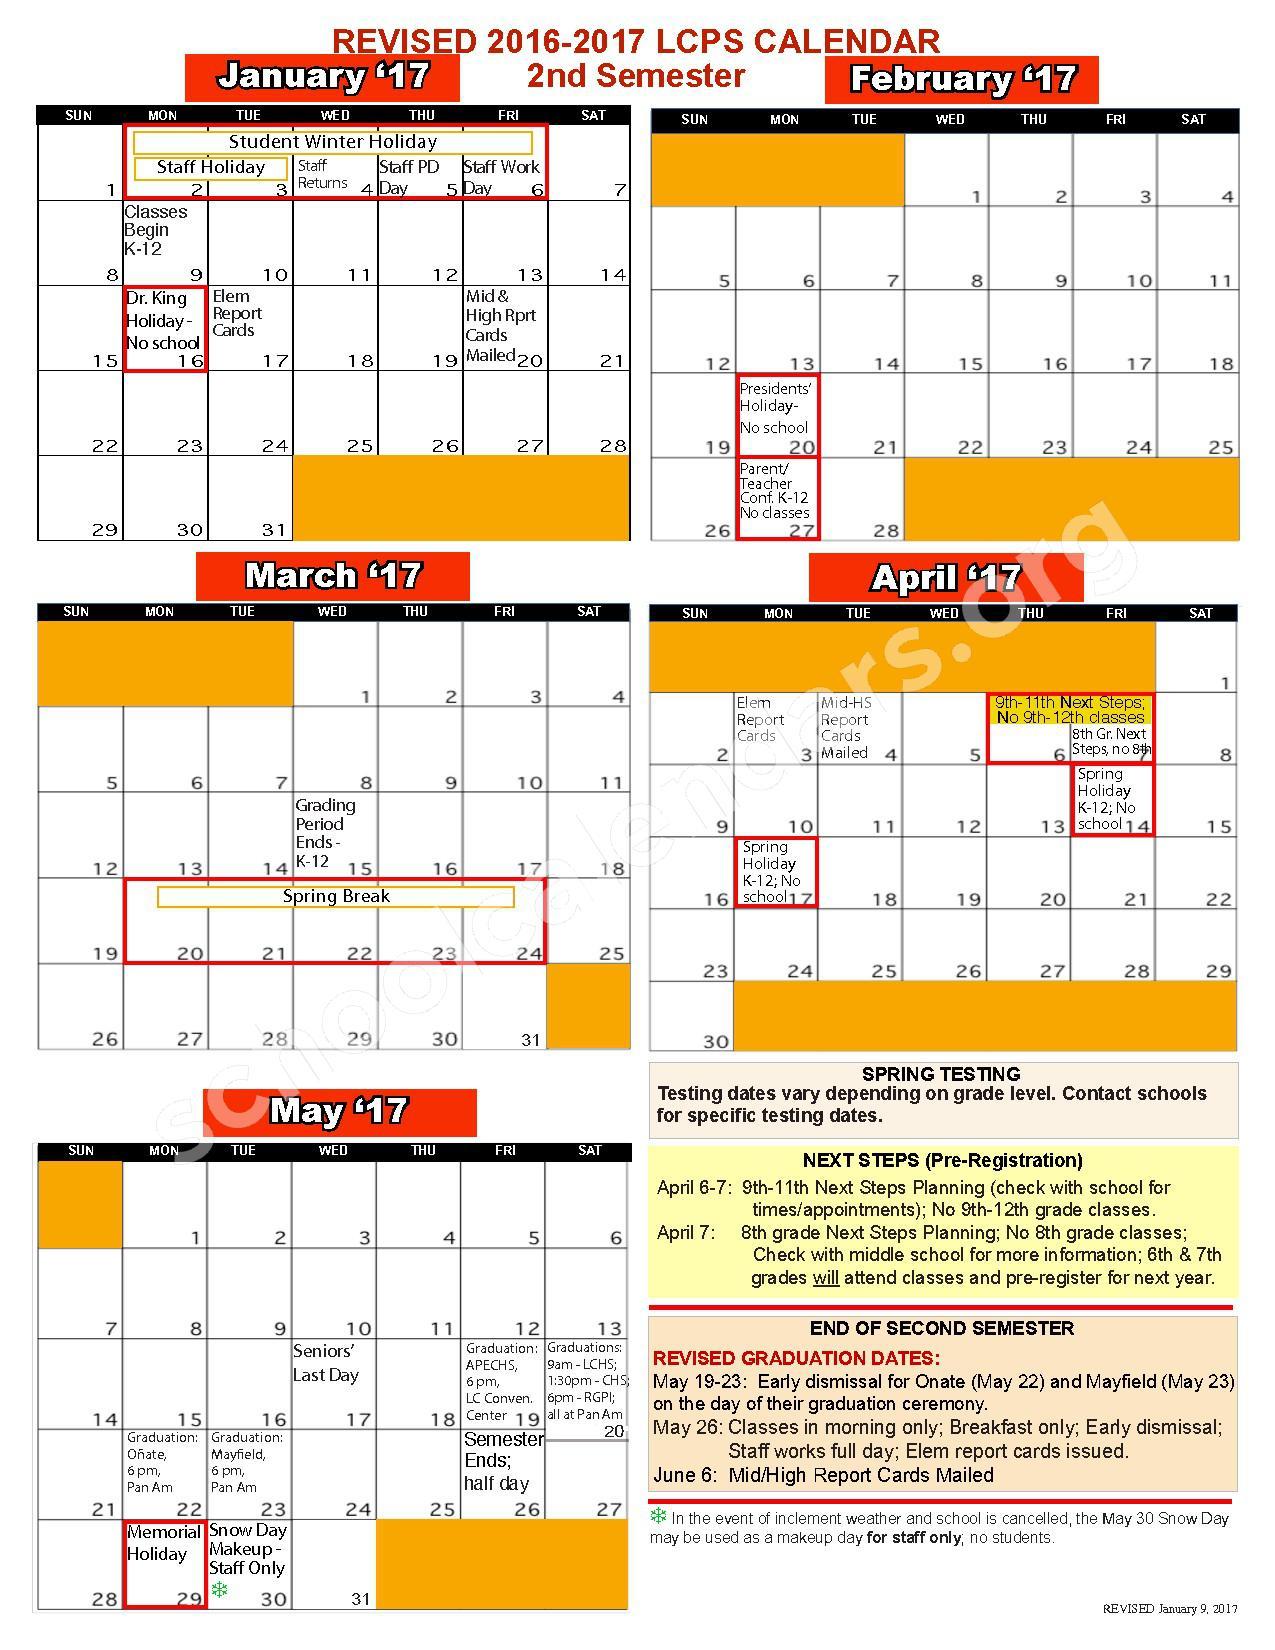 2016 - 2017 School Calendar | Las Cruces Public Schools Throughout Las Cruces Ps Calendar